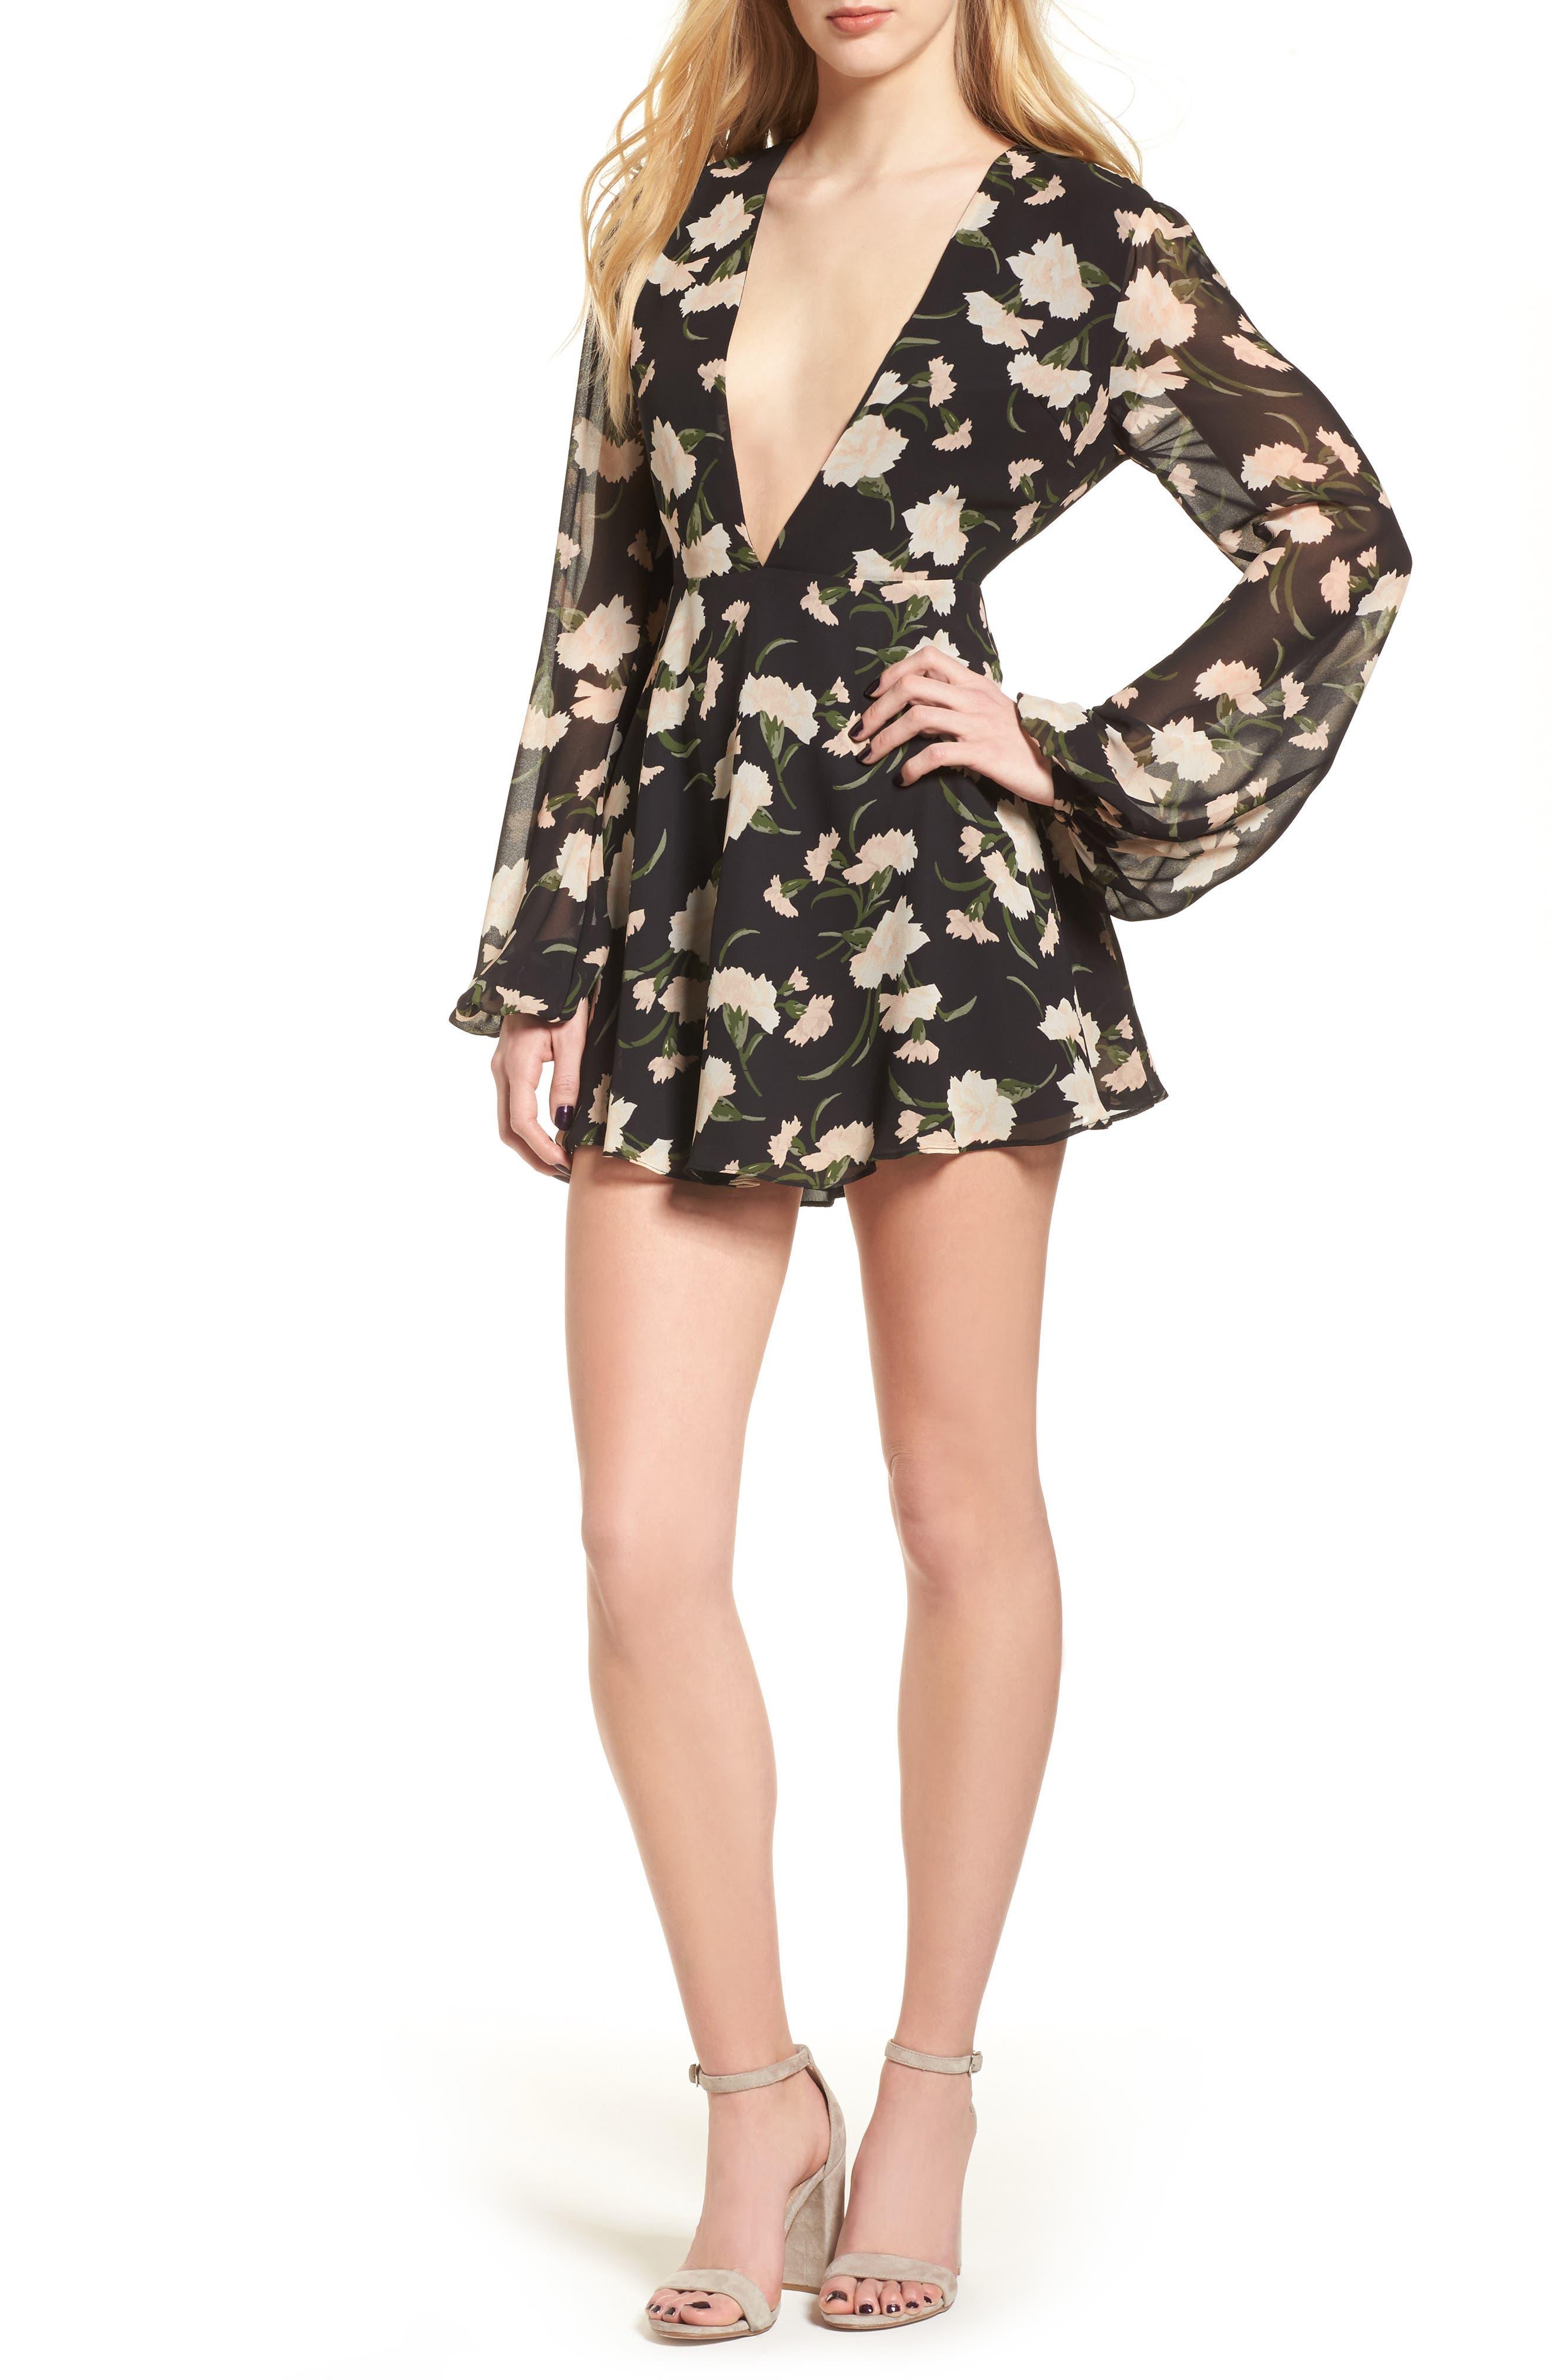 Hopes Minidress,                         Main,                         color, Shea Floral